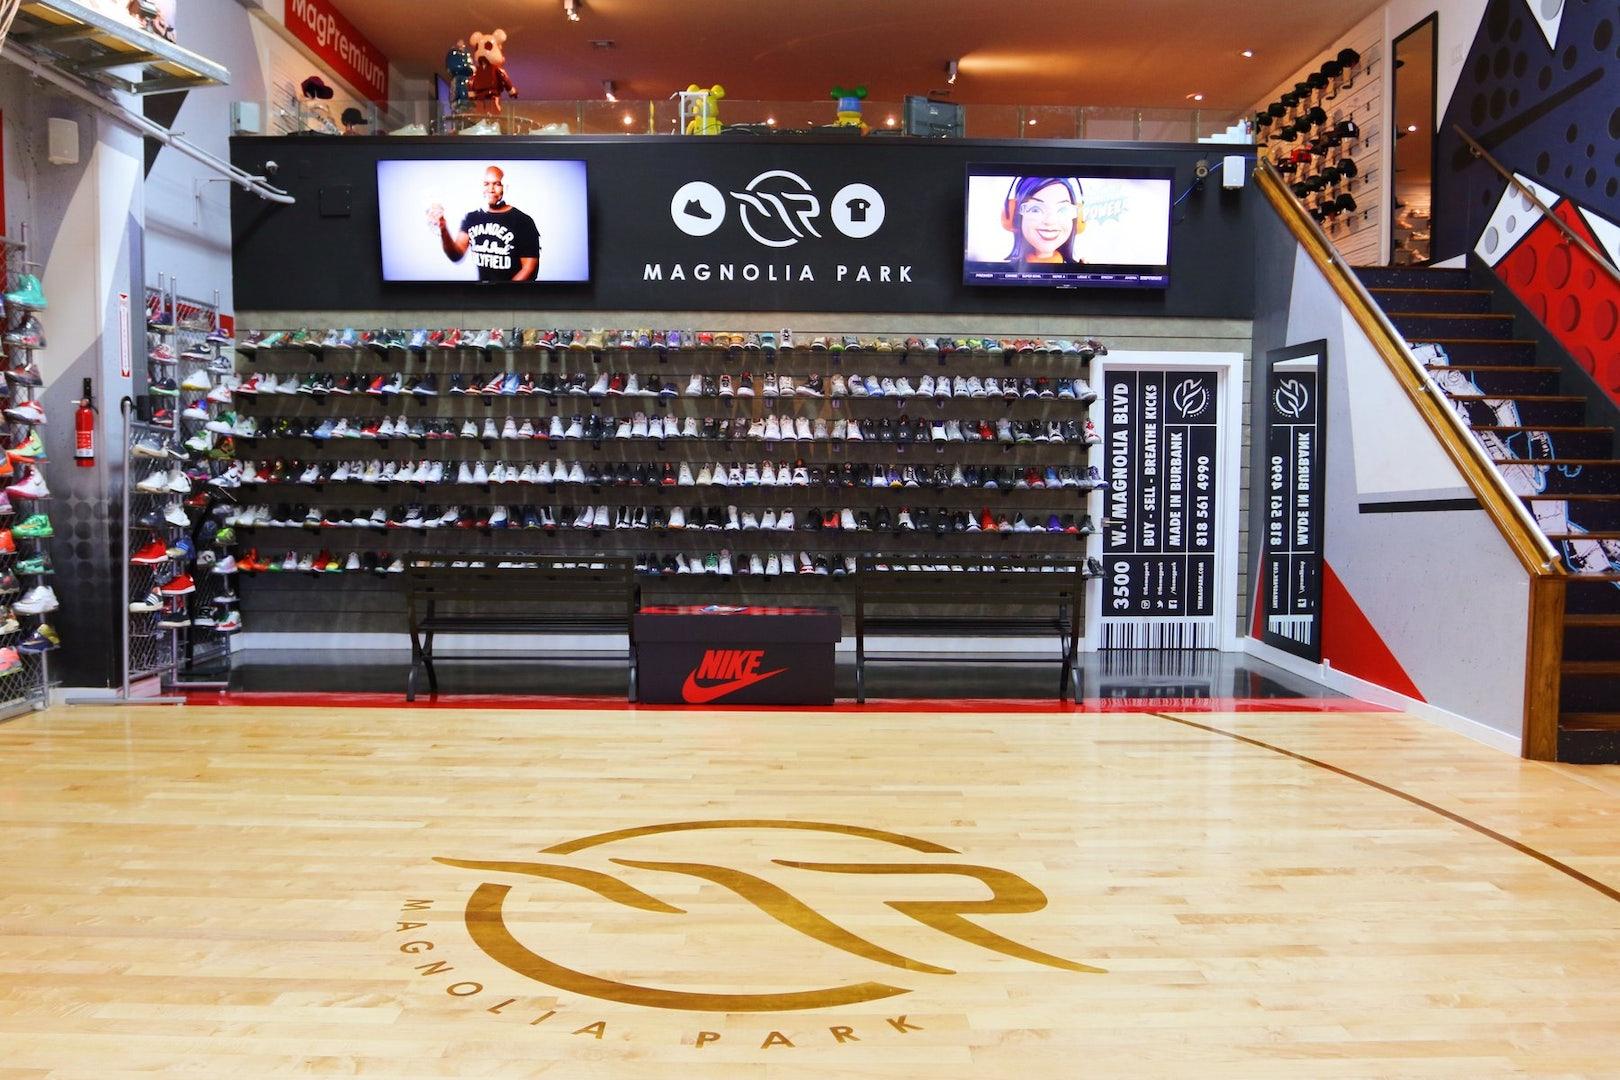 shoe store Magnolia Park in LA